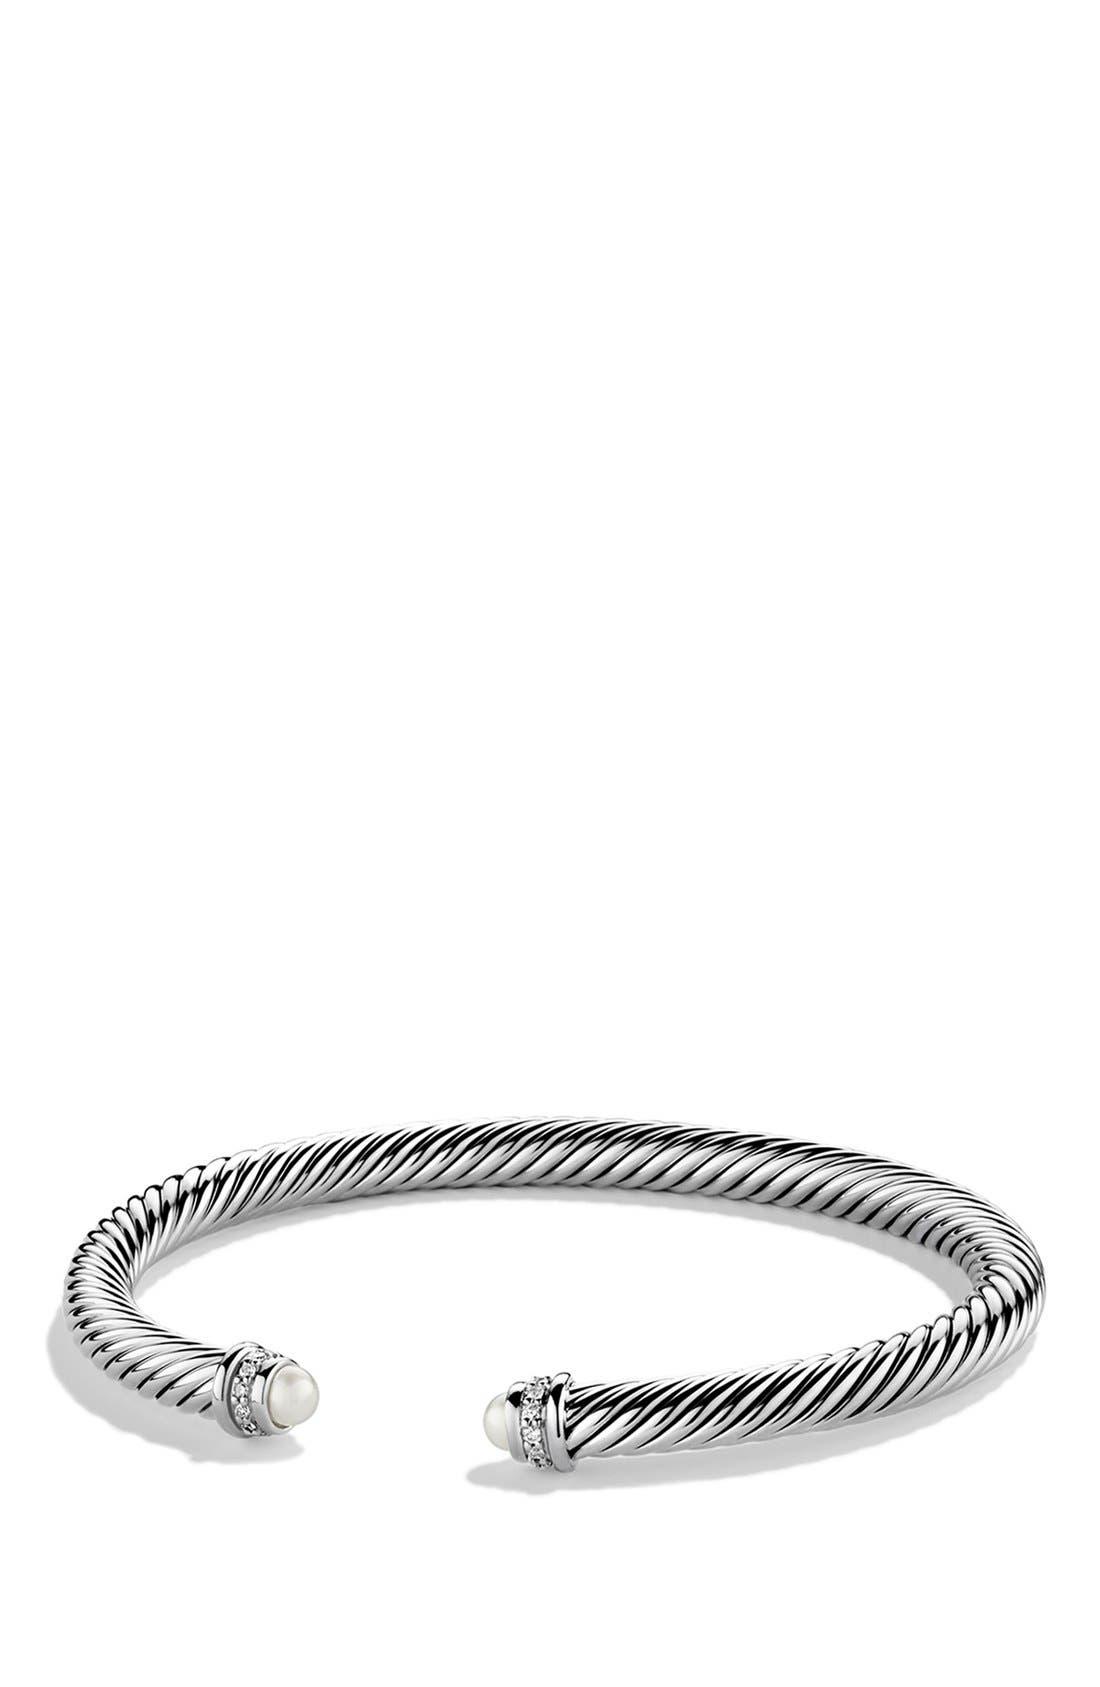 DAVID YURMAN, Cable Classics Bracelet with Semiprecious Stones & Diamonds, 5mm, Main thumbnail 1, color, PEARL